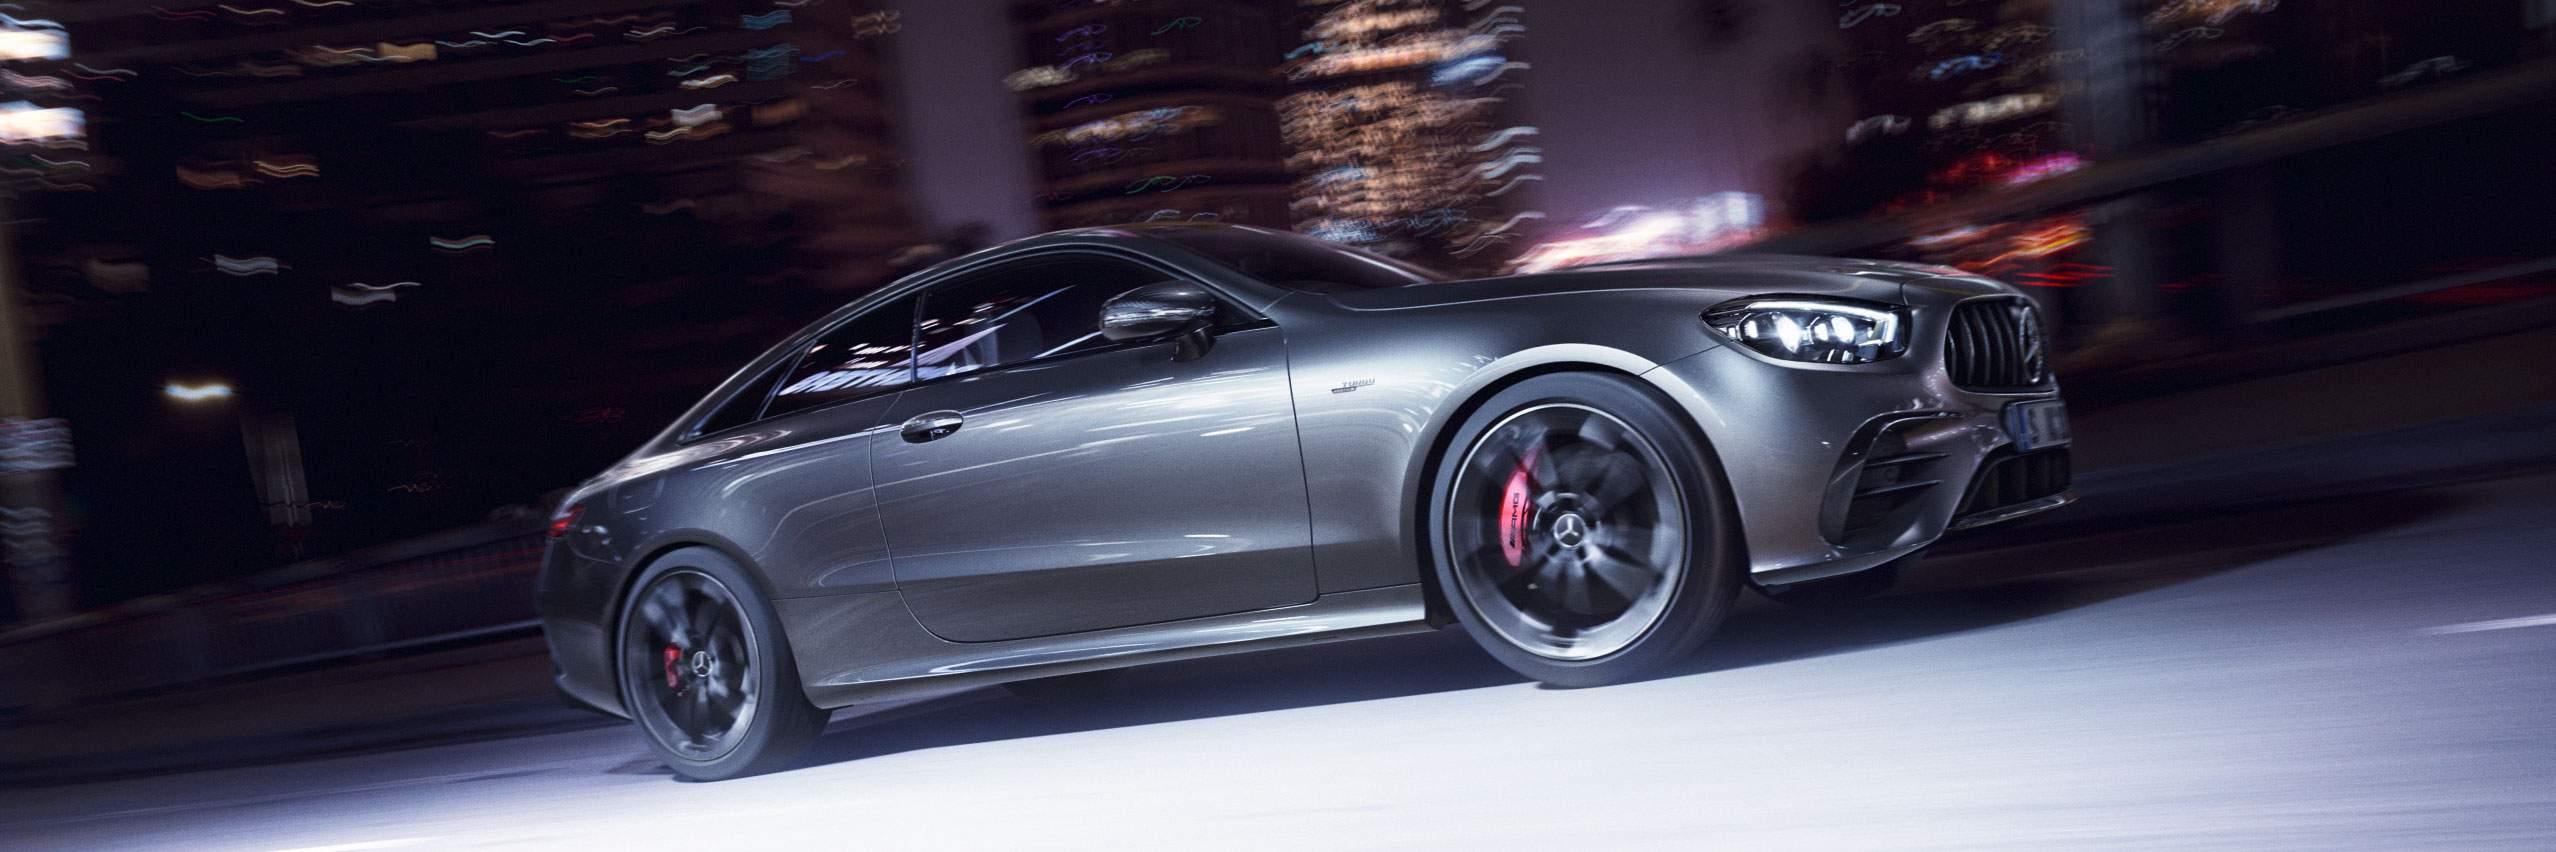 CAR-Avenue-Mercedes-AMG-Classe-E-Coupe-06